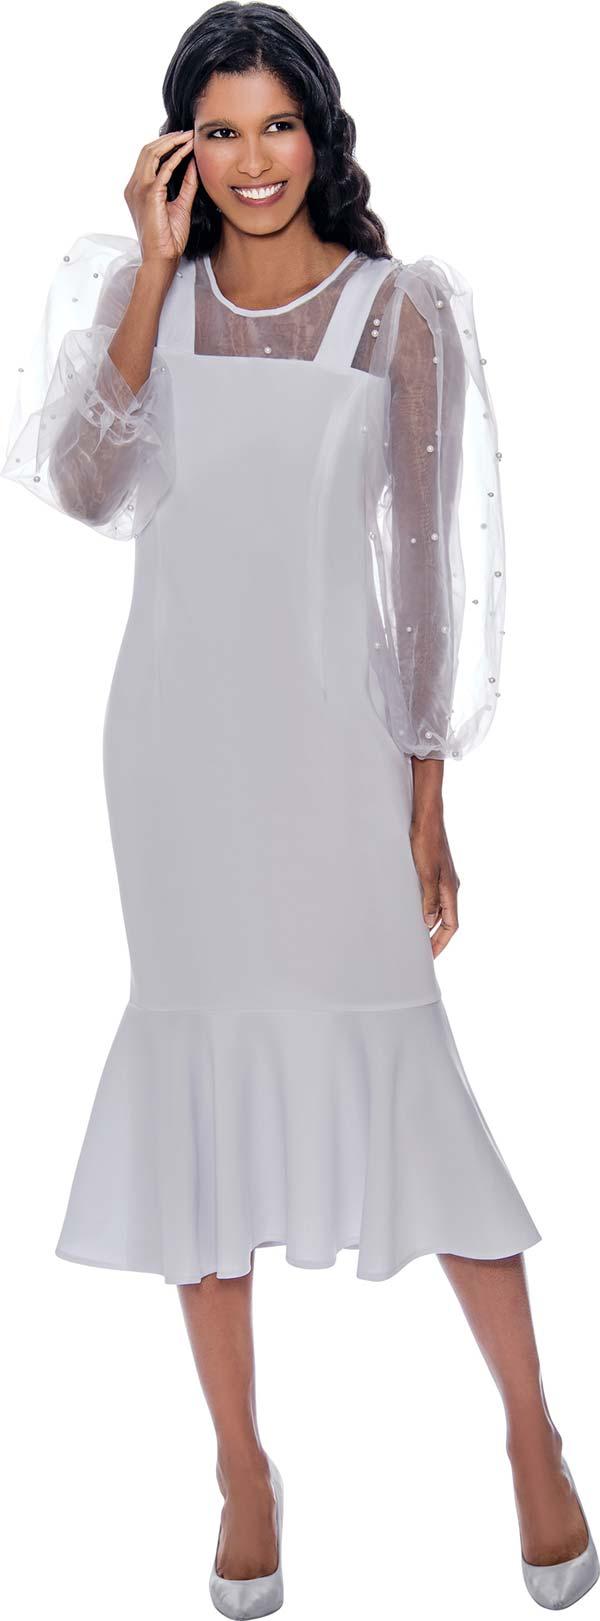 Nubiano Dresses DN1961 - Flounce Hemline Dress With Mesh Yoke And Bead Details